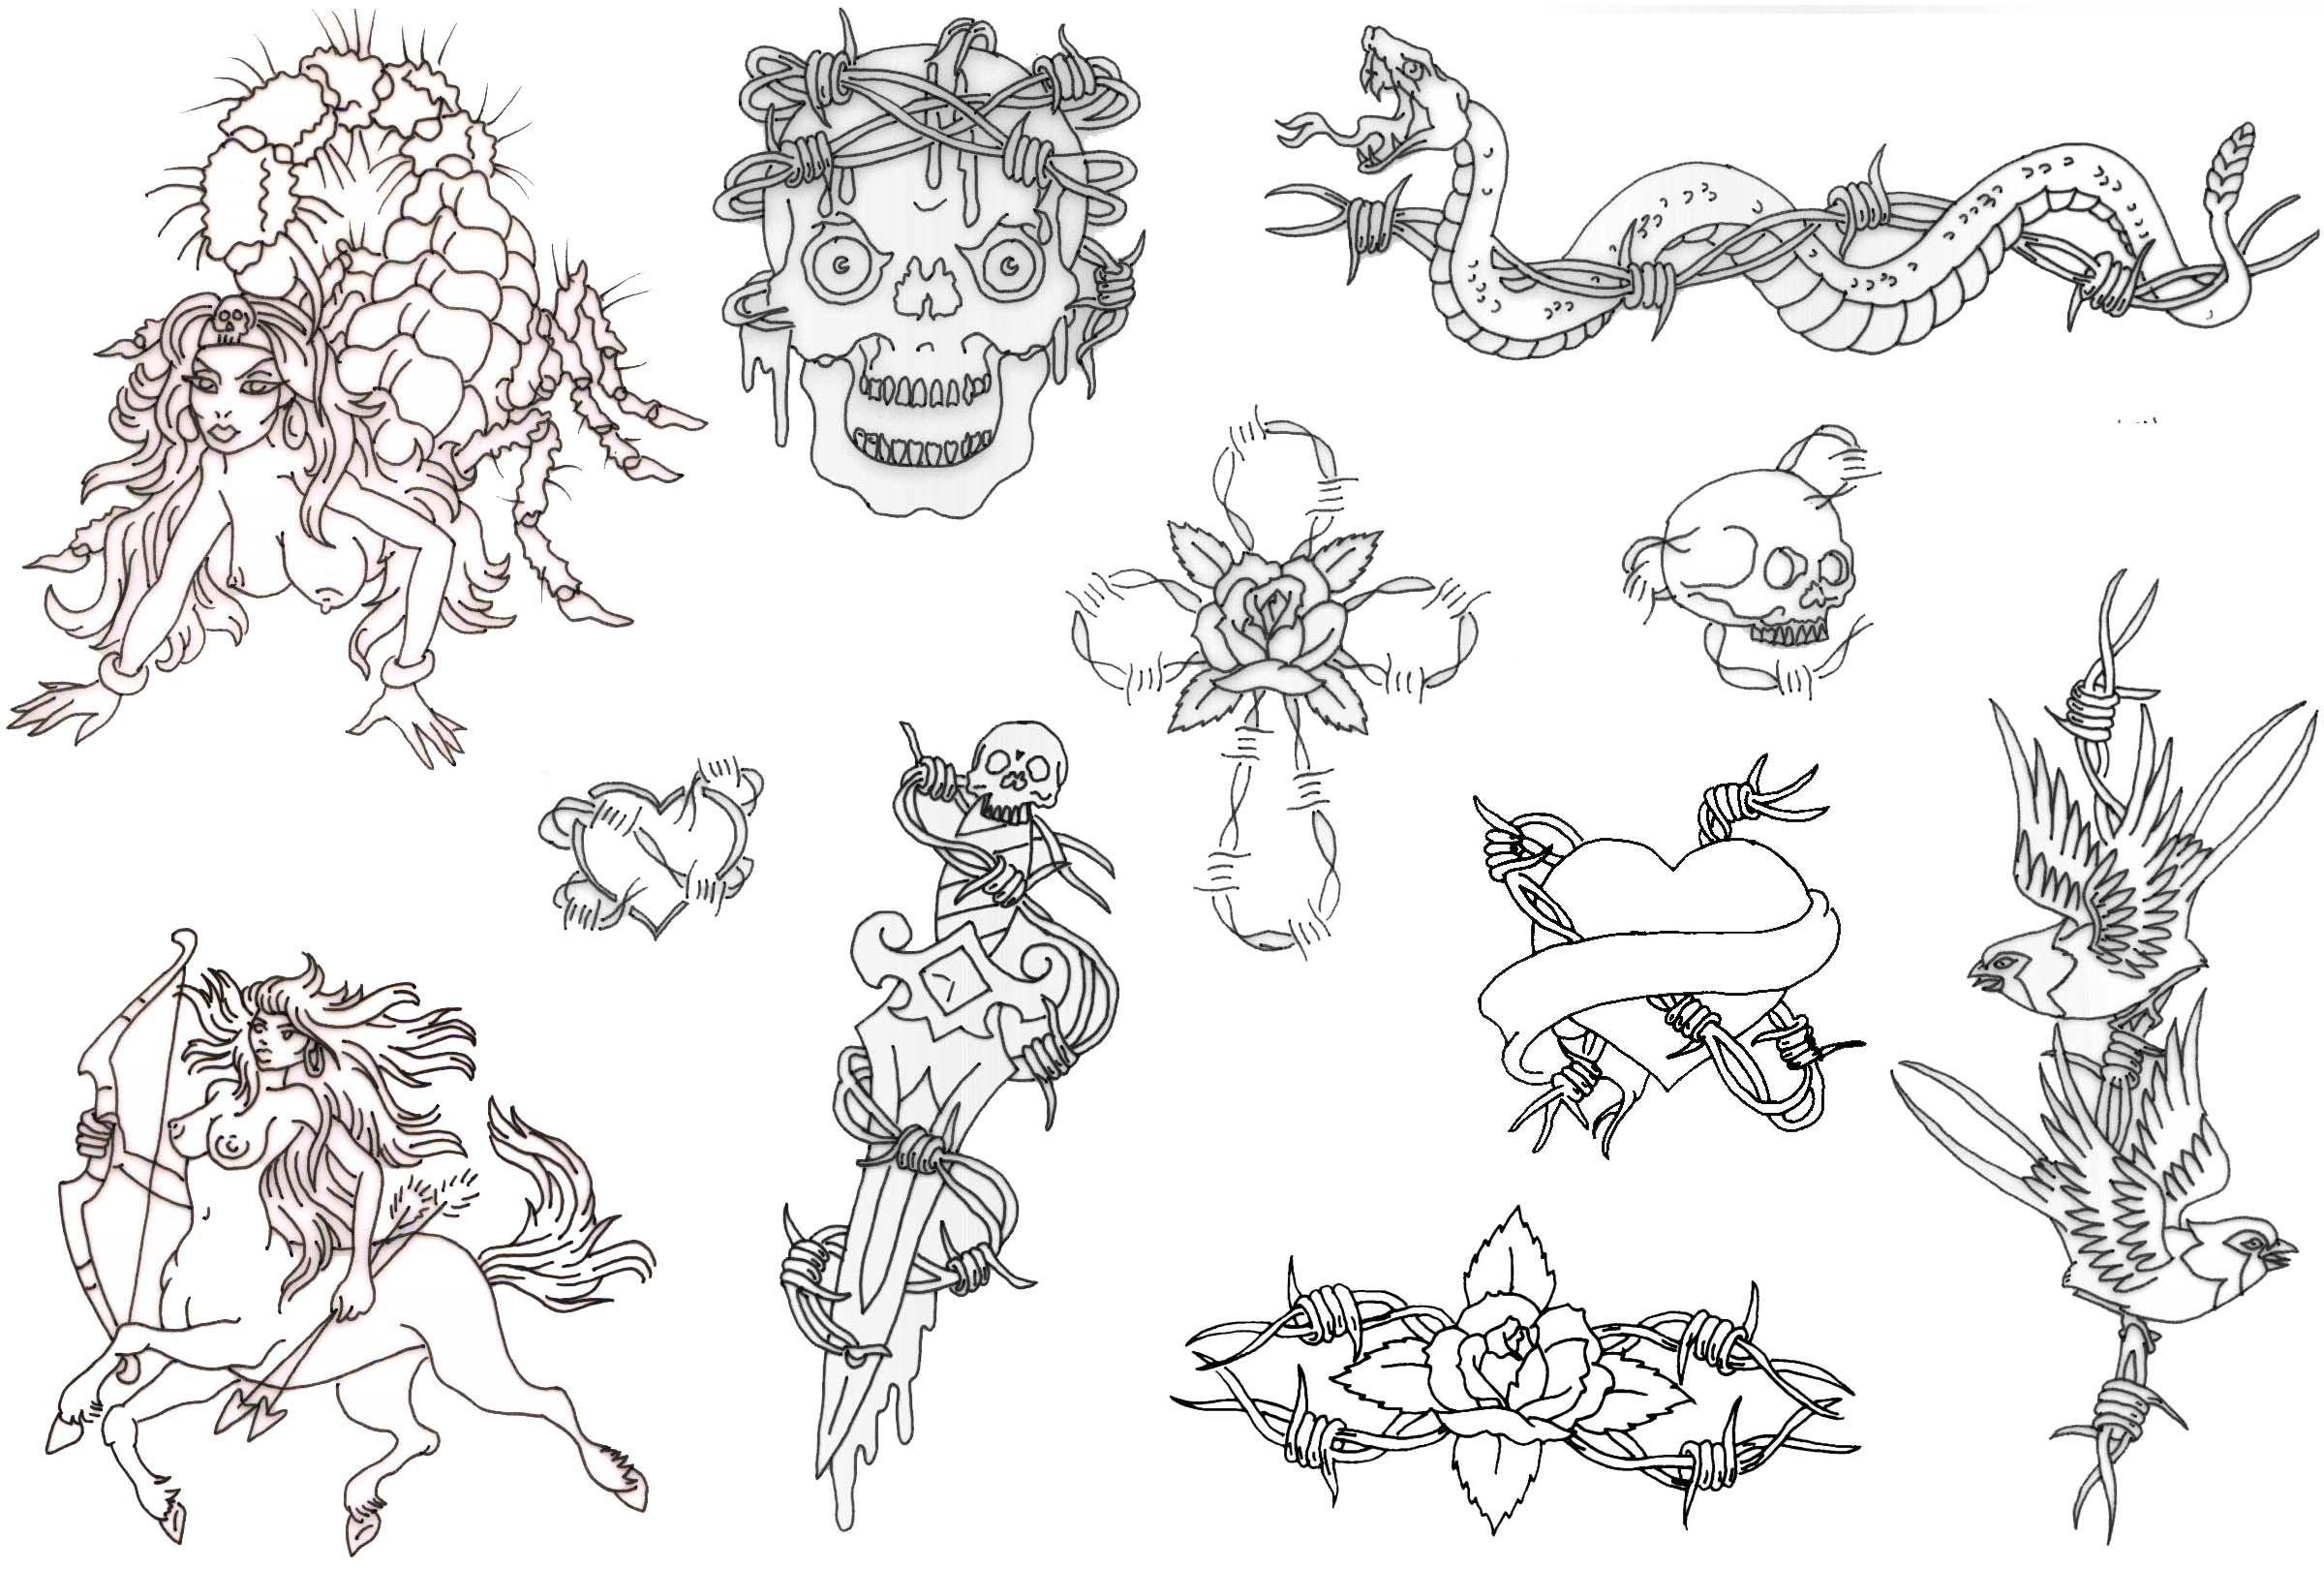 Free Printable Tattoo Flash | Album: Misc Flash Sheets Records 761 - Free Printable Tattoo Flash